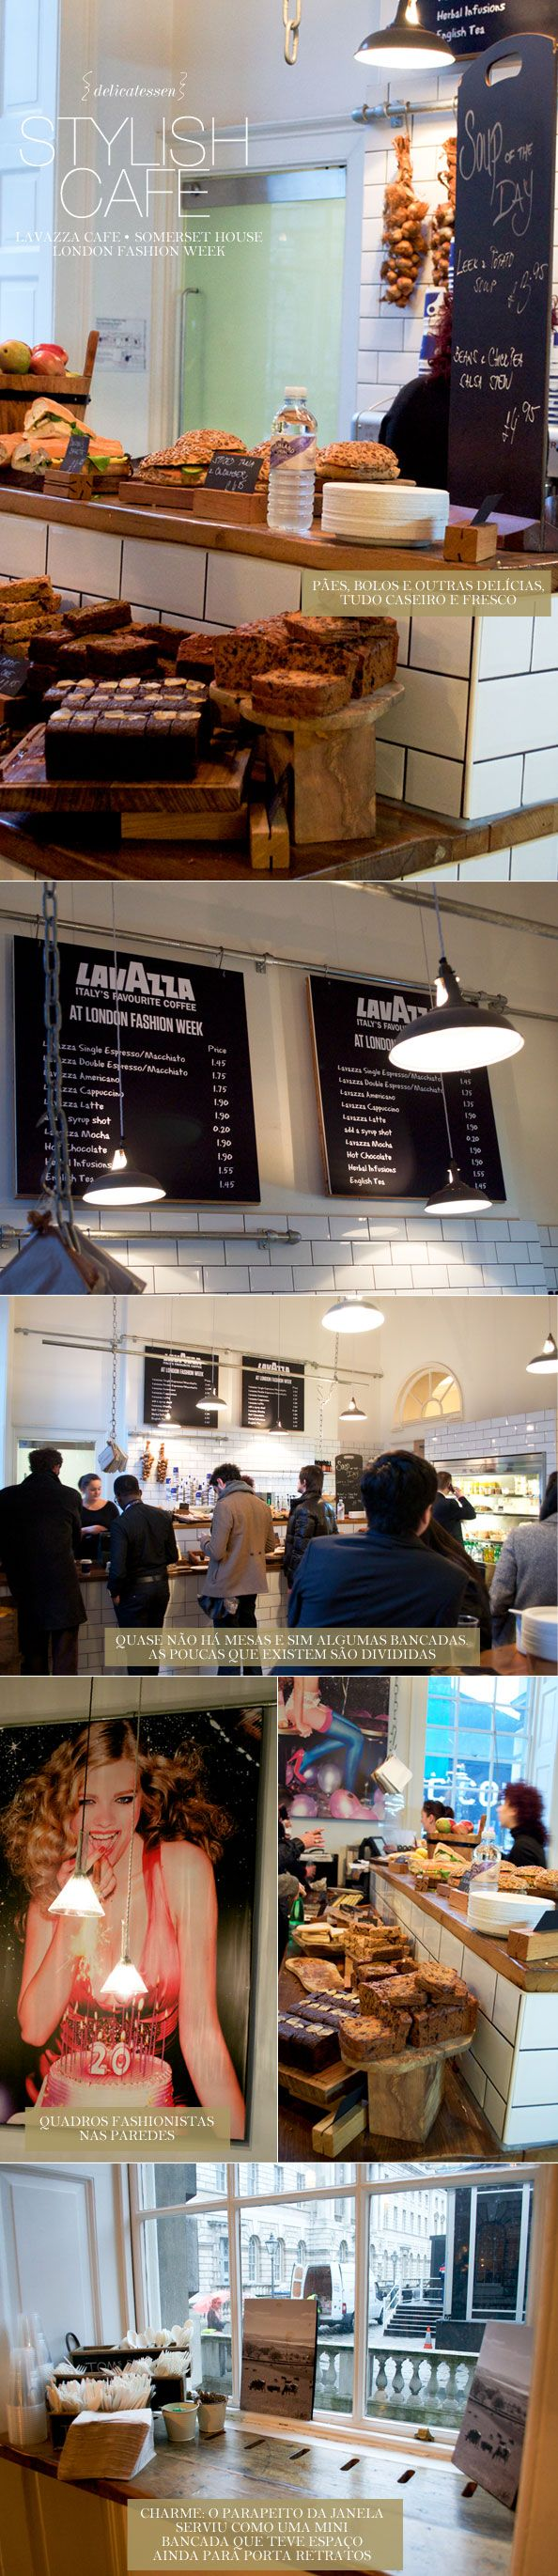 living-gazette-deli-cafe-lavazza-london-fashion-week-somerset-house